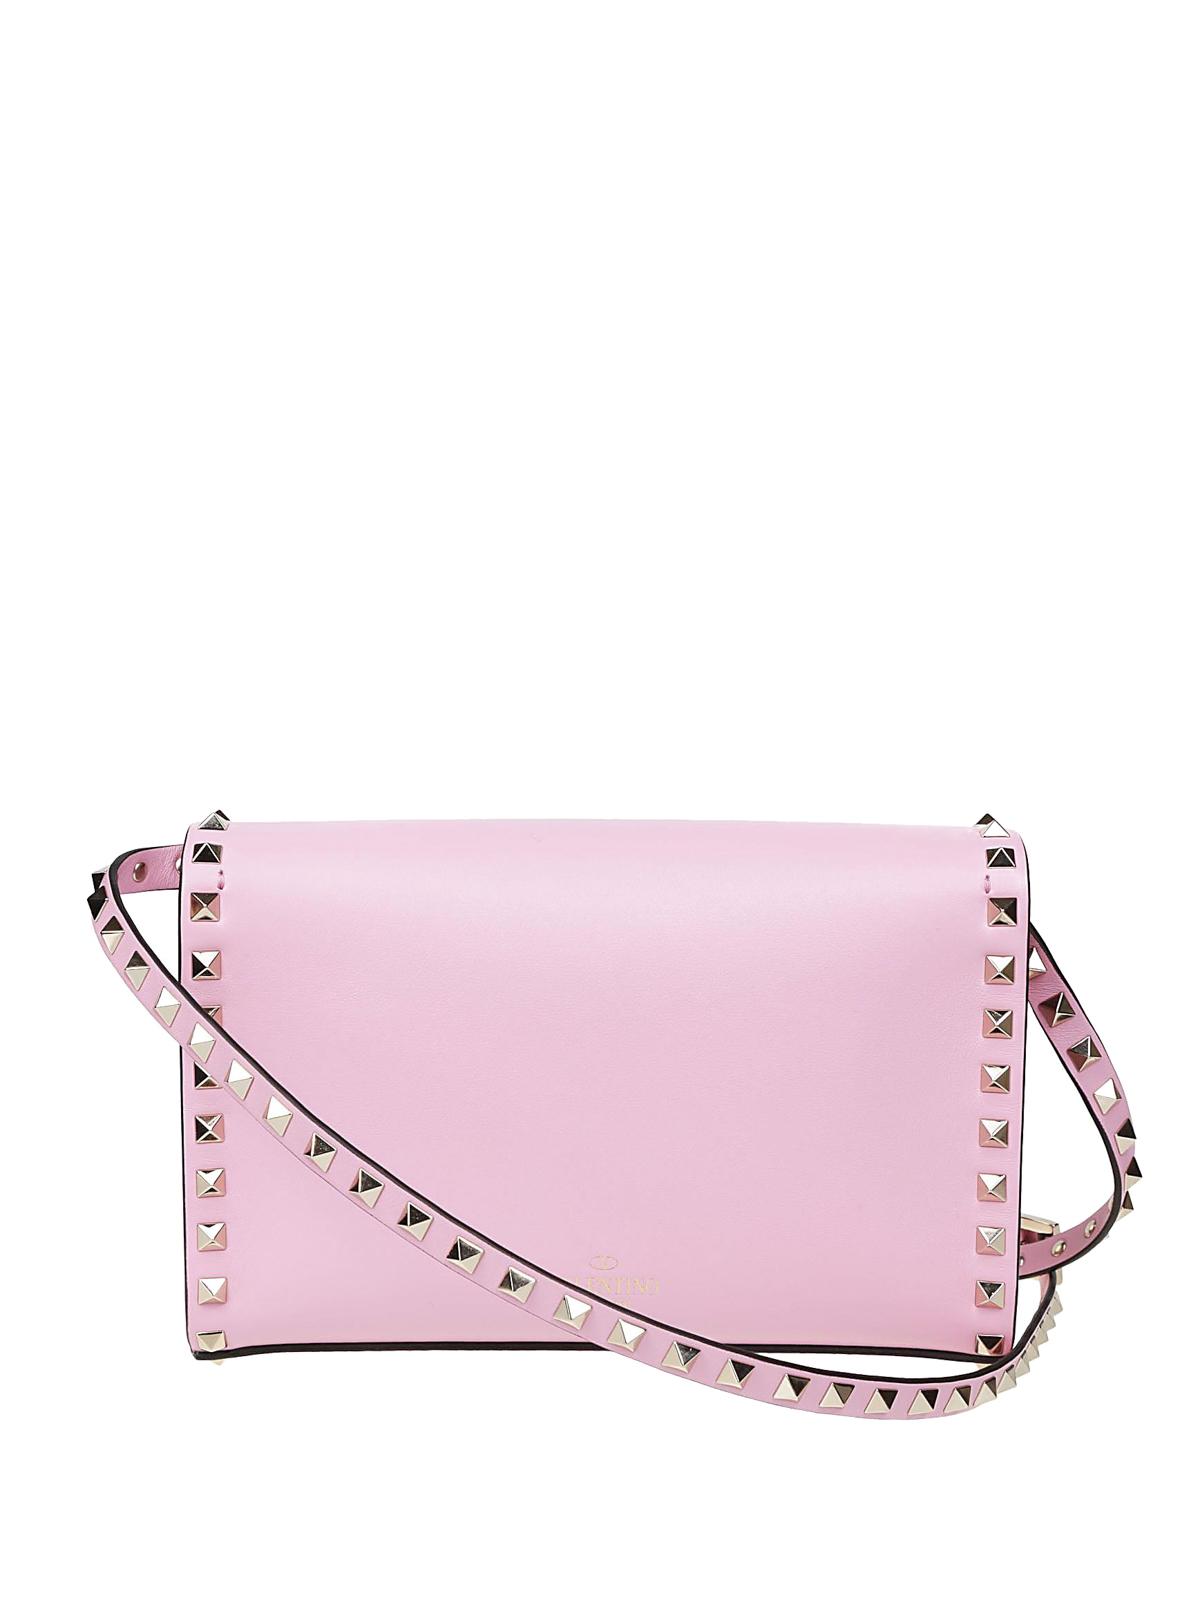 390b81a7c534 iKRIX VALENTINO GARAVANI  cross body bags - Rockstud pink smooth leather  small bag